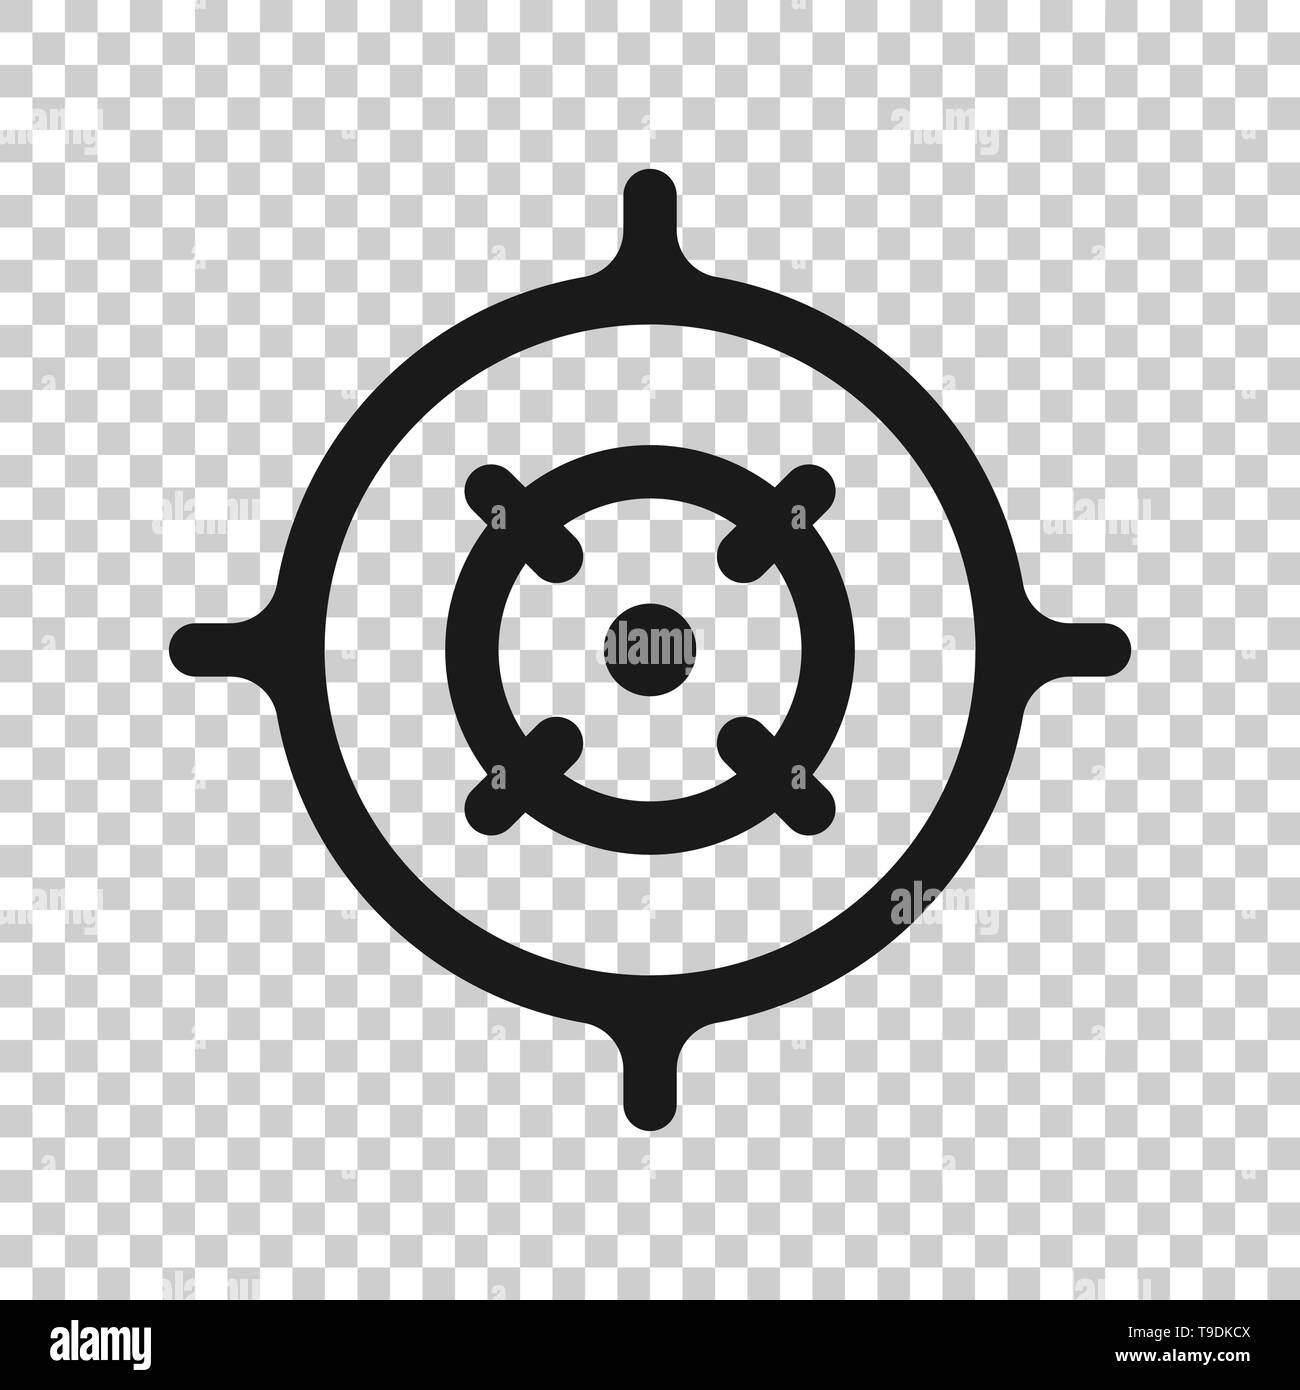 Transparent Crosshair Simple Background